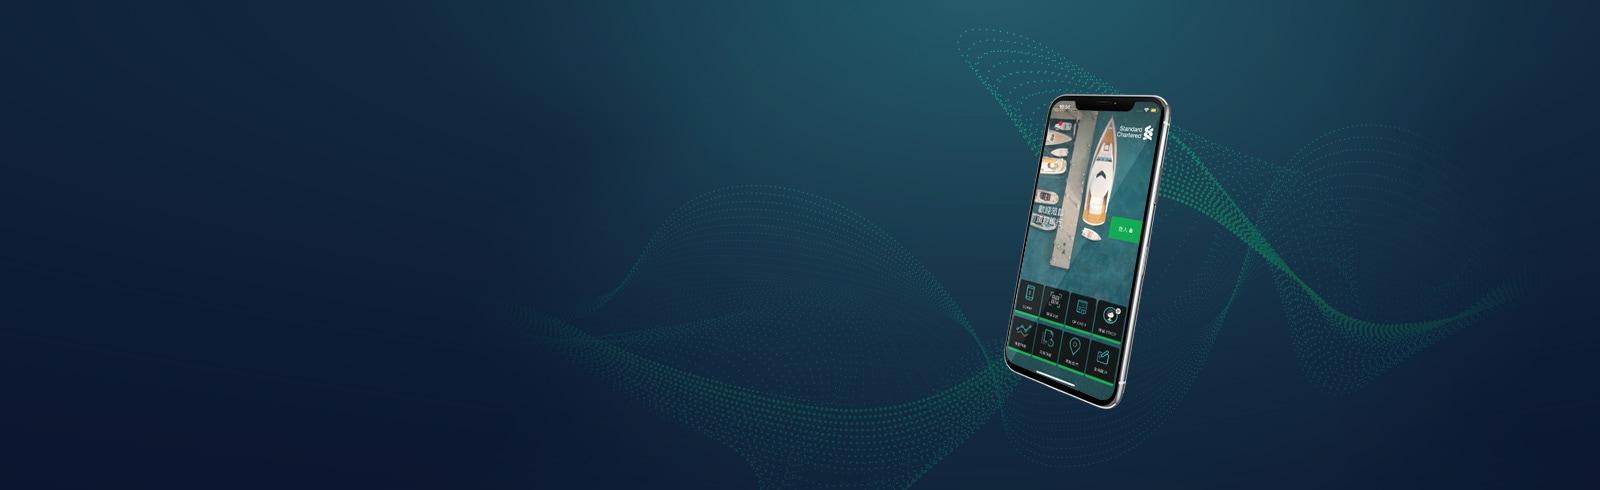 Hk sc mobile banking masthead zh